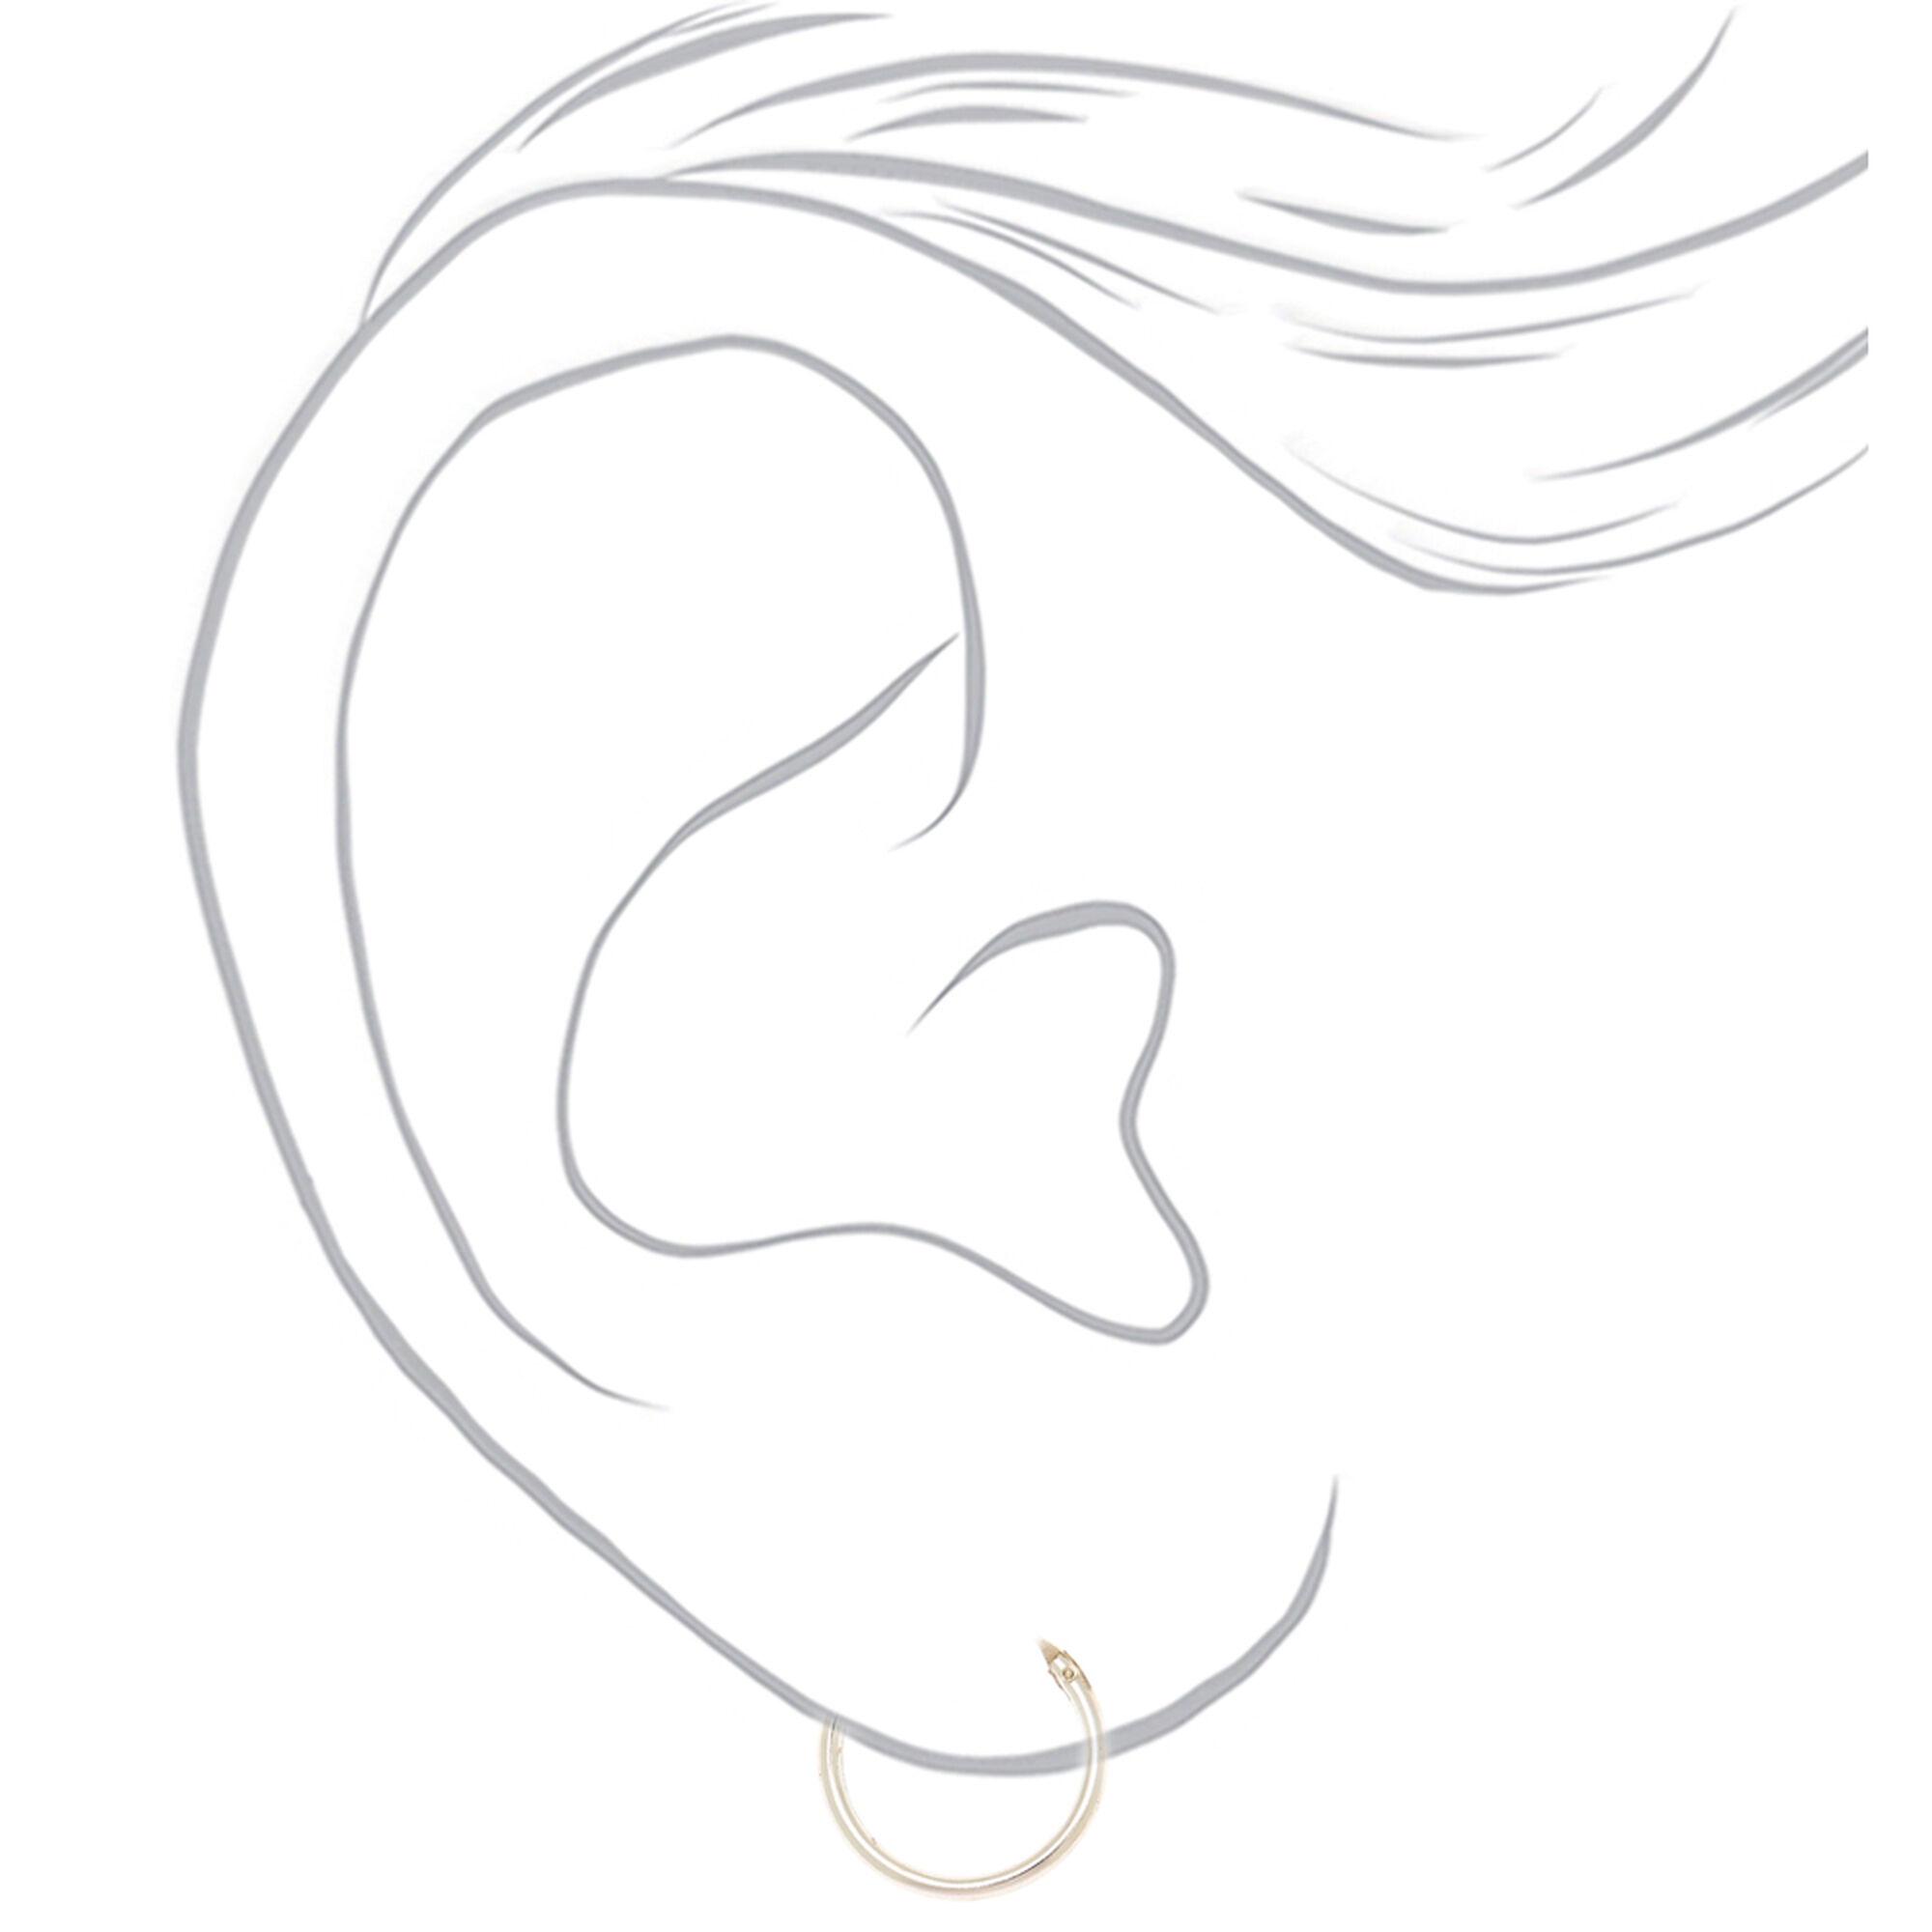 b27cd3a9aaa628 Sterling Silver 14MM Hinged Hoop Earrings | Claire's US